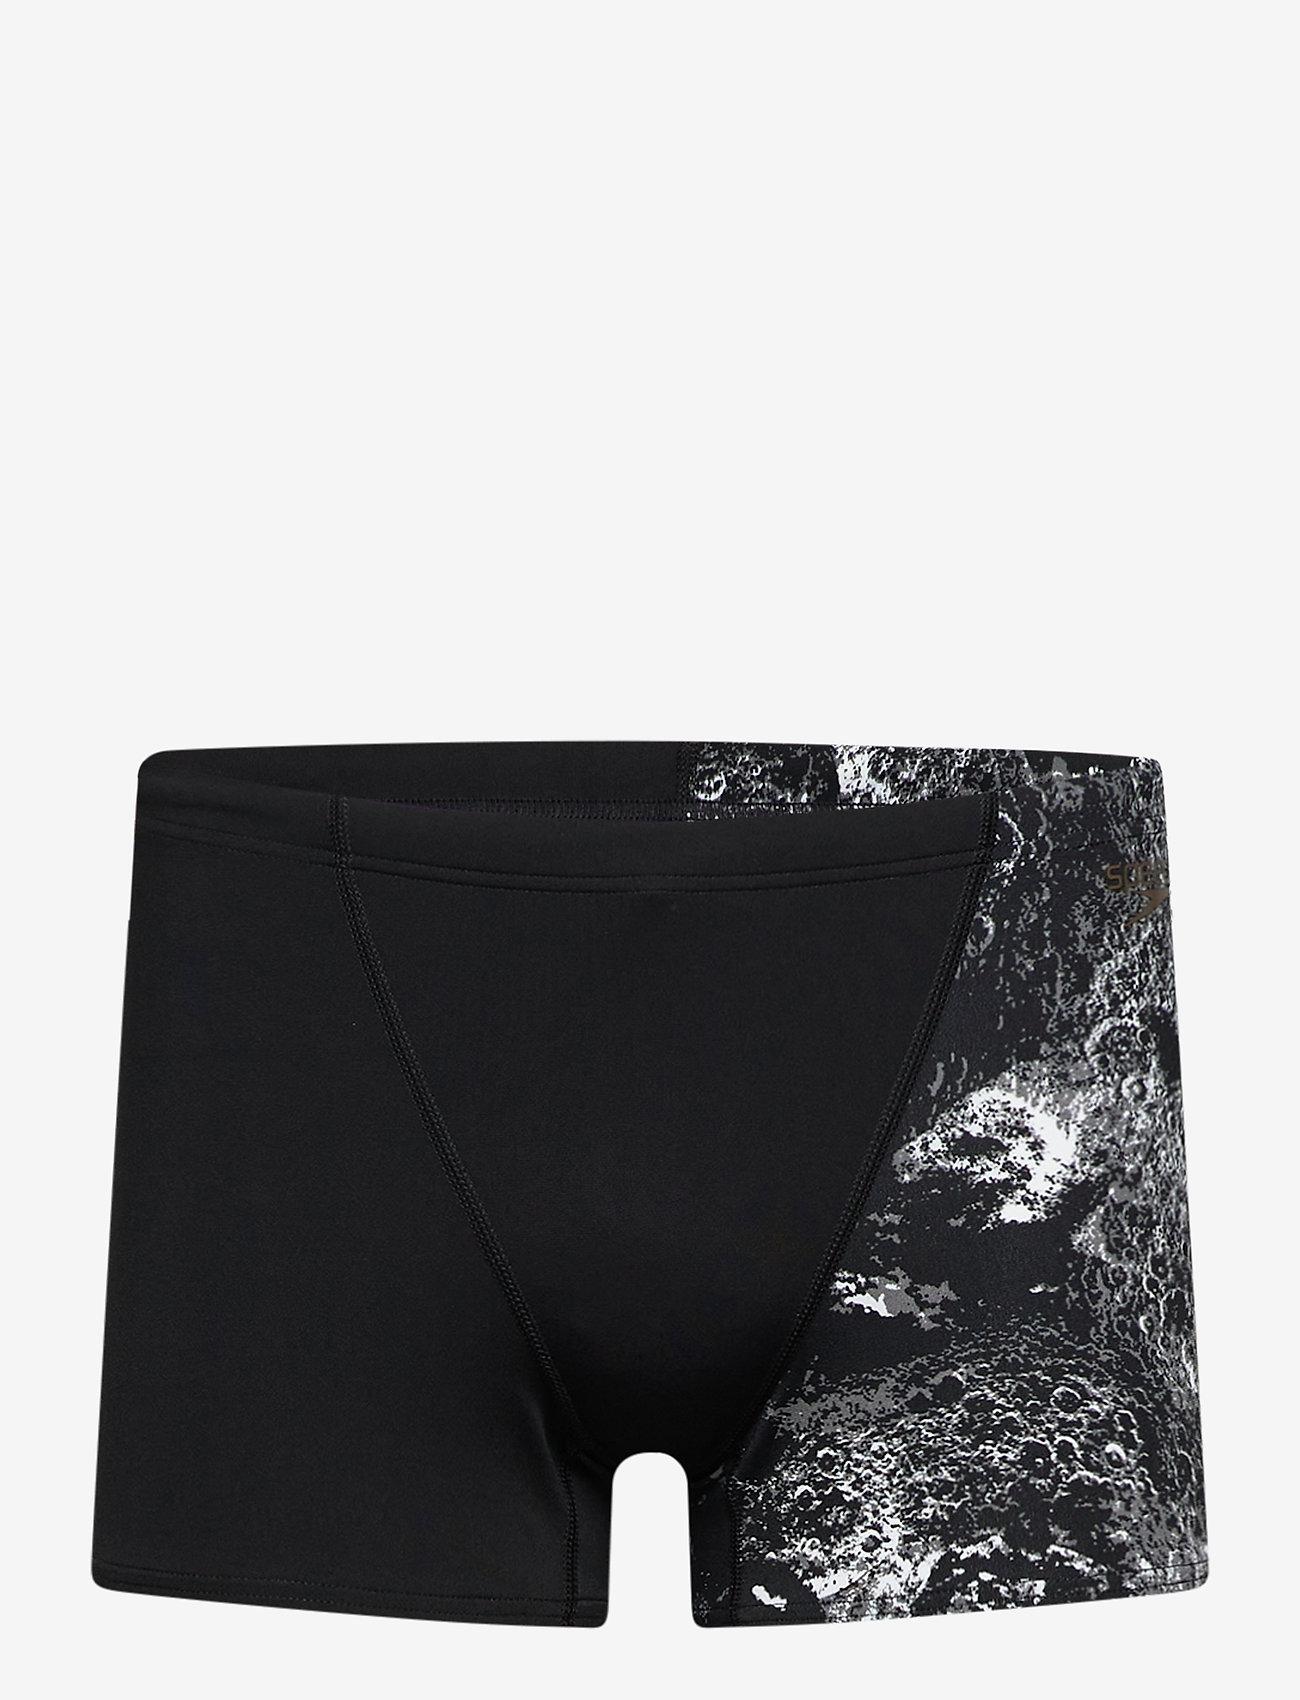 "Speedo - SPEEDO ALLOV DIGI V AQUASHORT NAV/ORA 2(28"") - shorts - black/usa charcoal/white - 0"